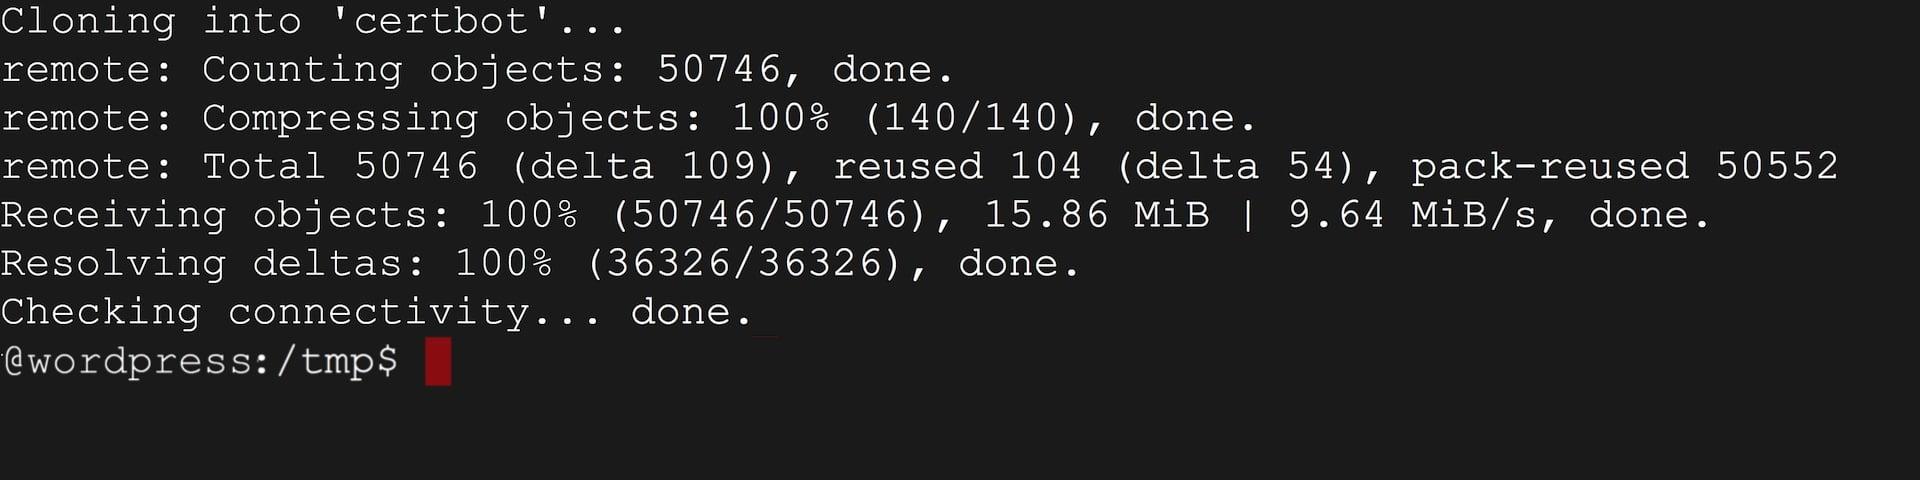 linux git certbot 使用 Certbot 安裝 Let's Encrypt 的免費 SSL 憑證與證書密鑰到 WEB 網頁服務器(WordPress 支援)